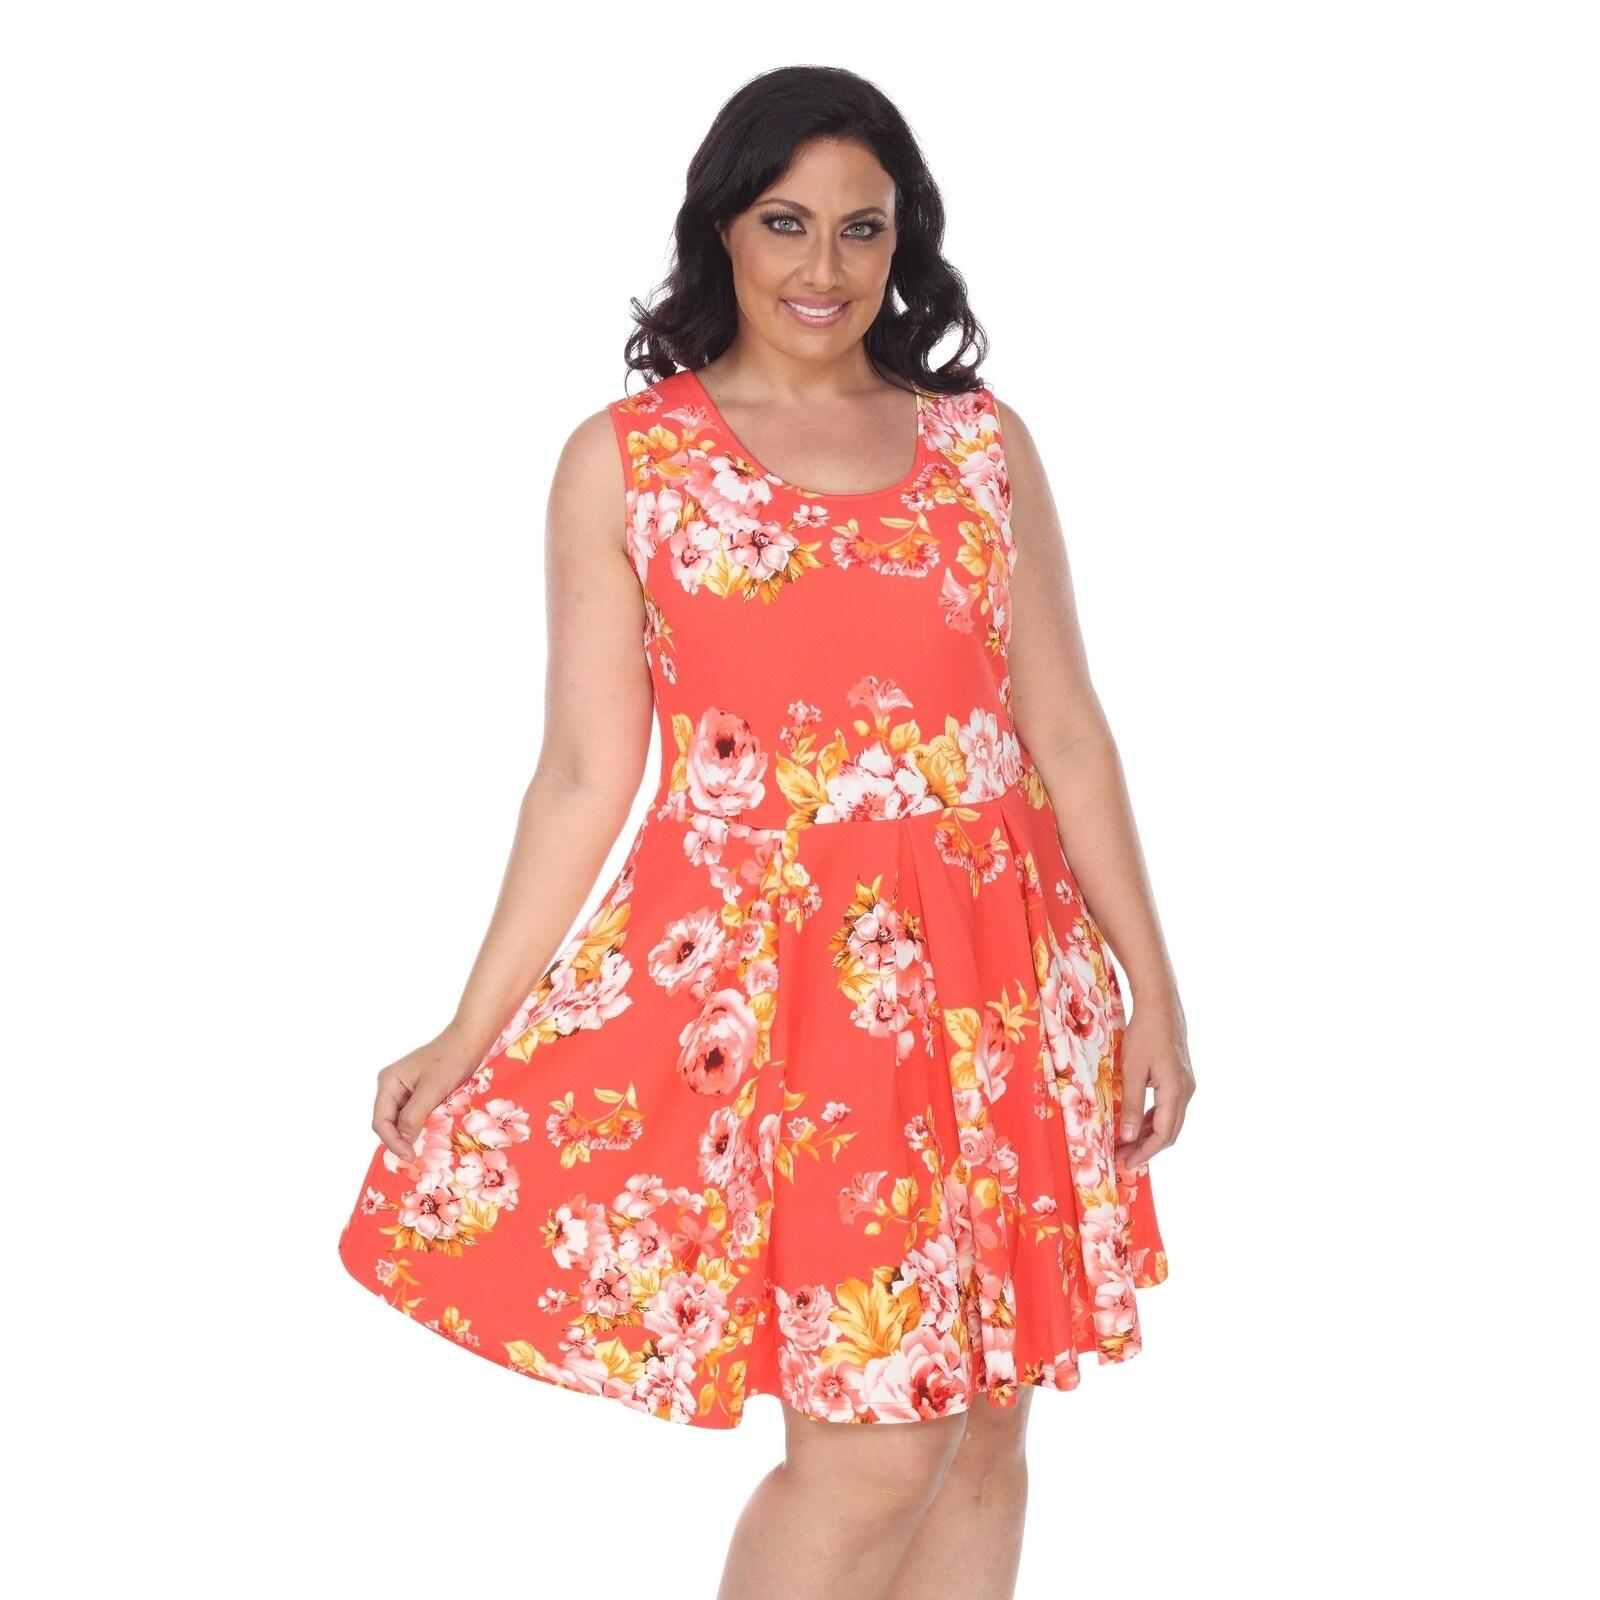 32575804302 Shop White Mark Plus Flower Print 'Crystal' Dress - Free Shipping On ...